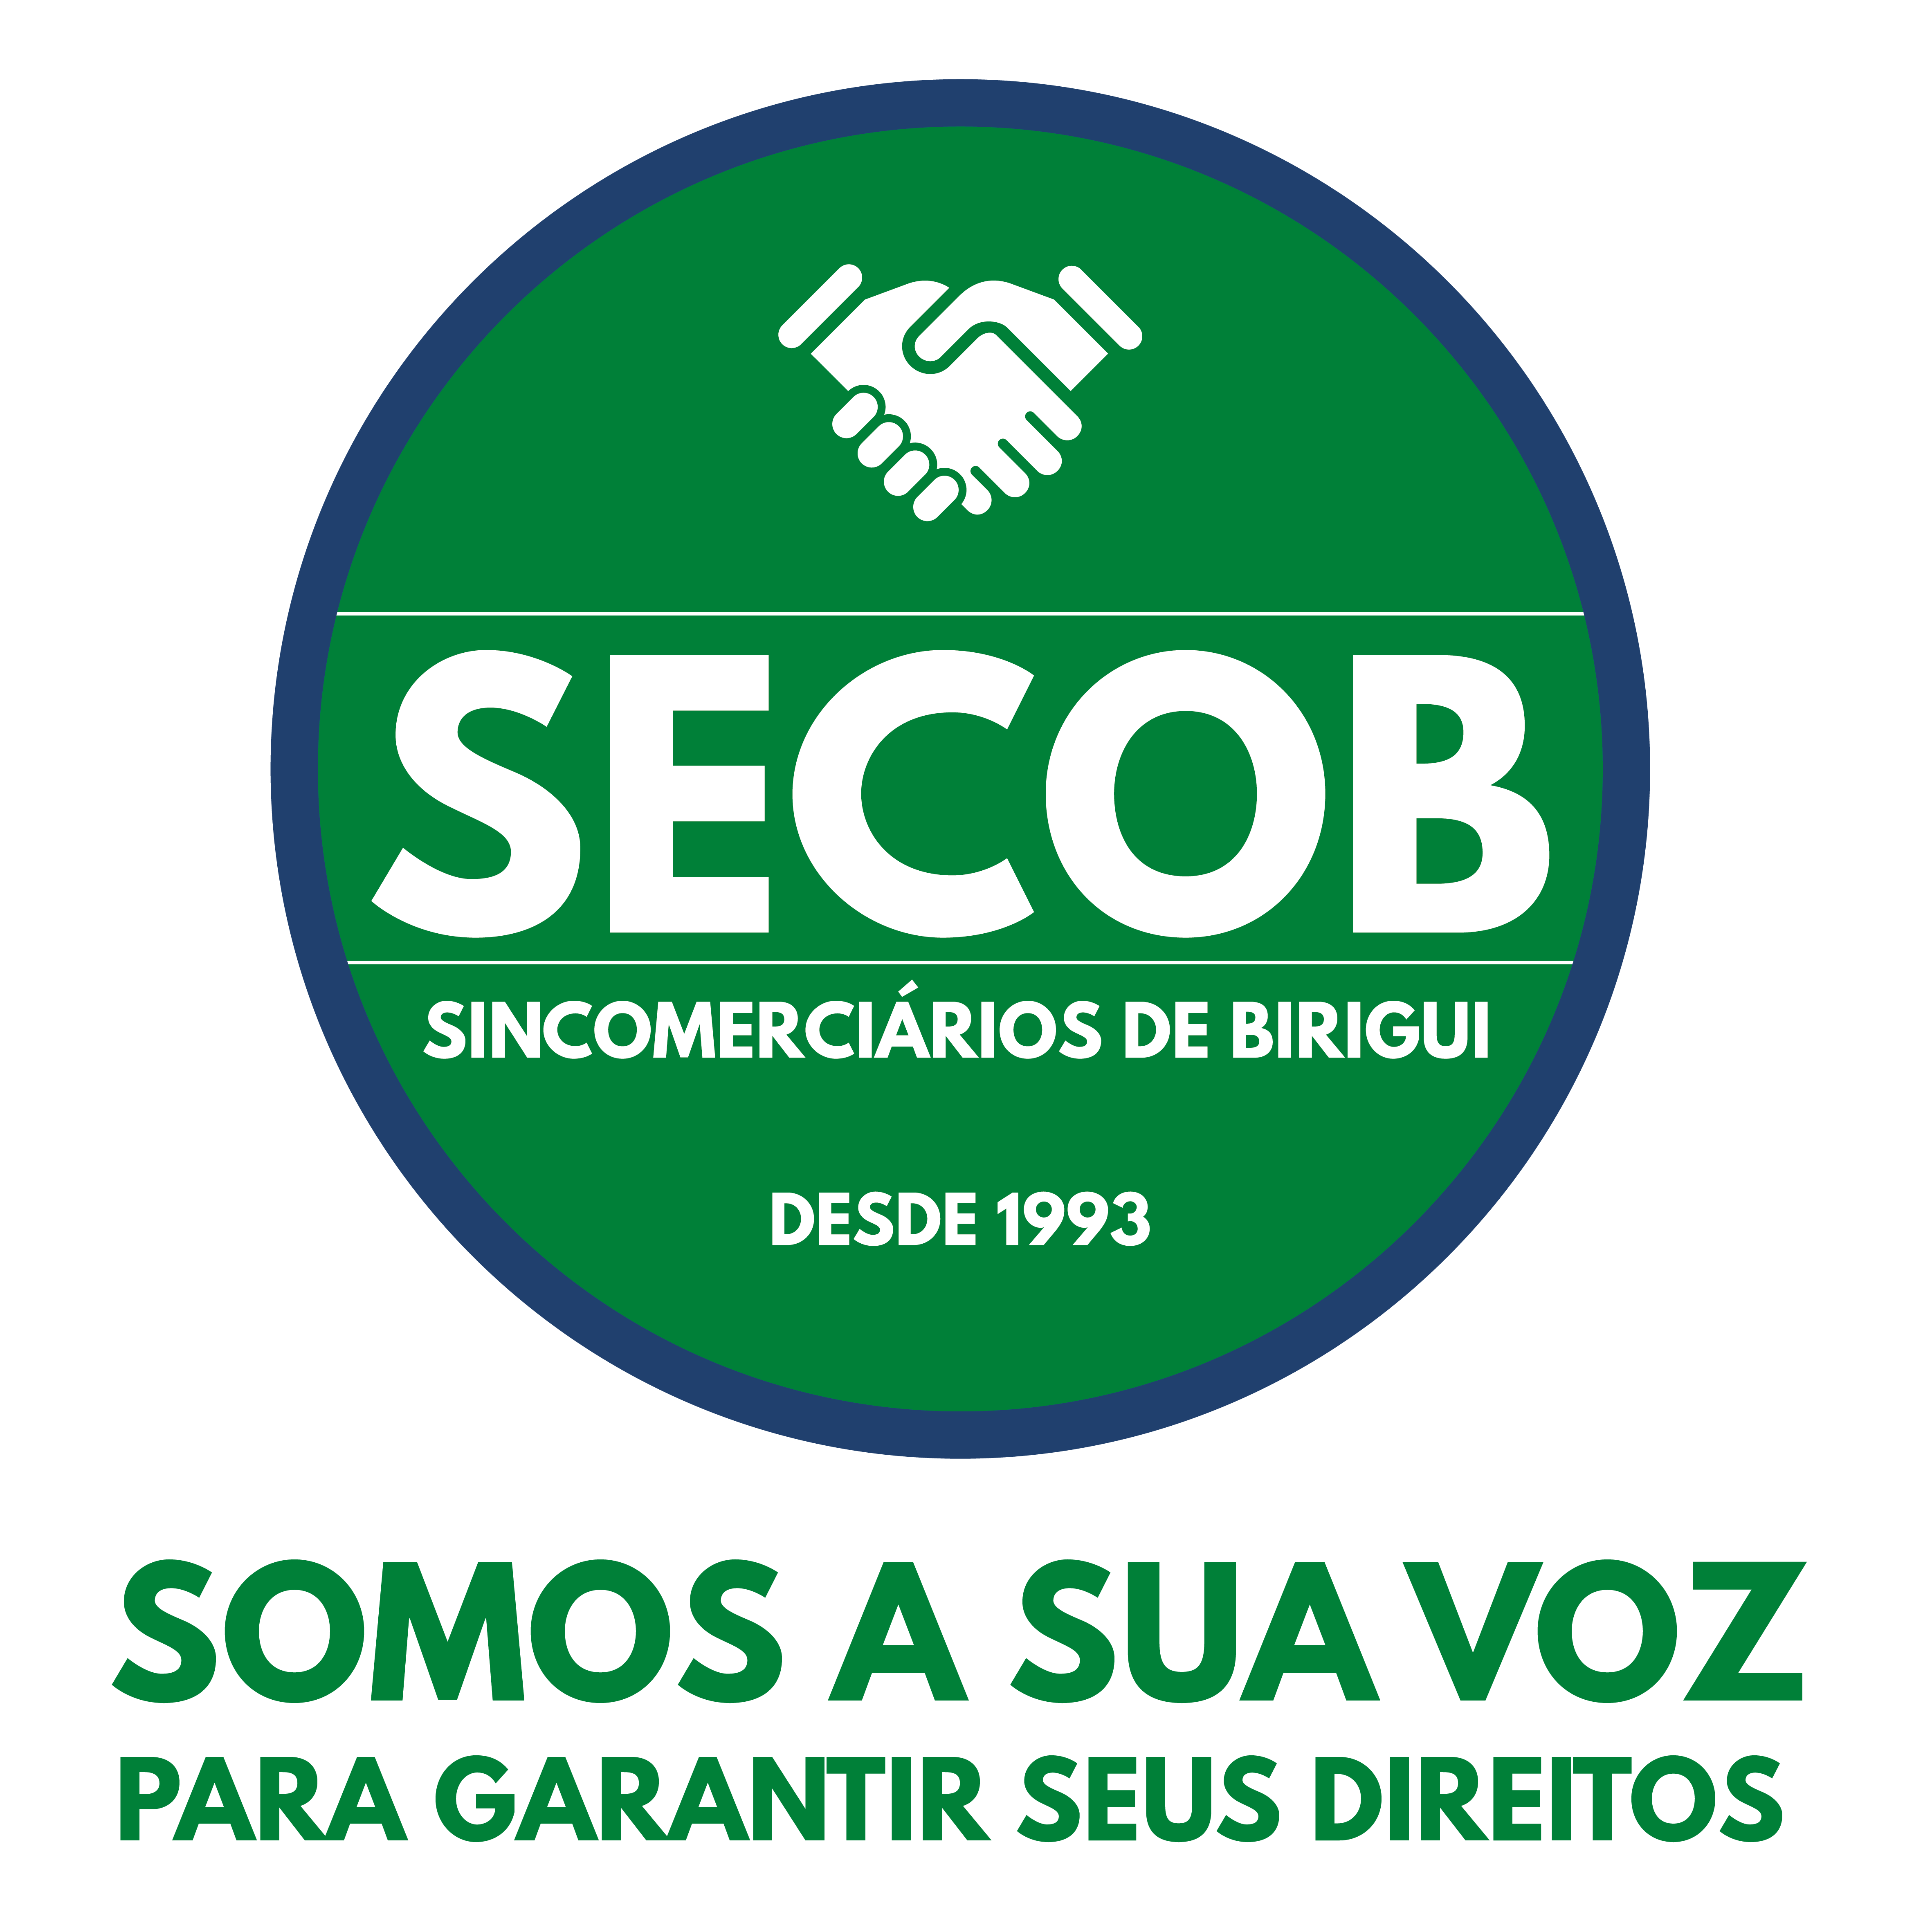 Secob